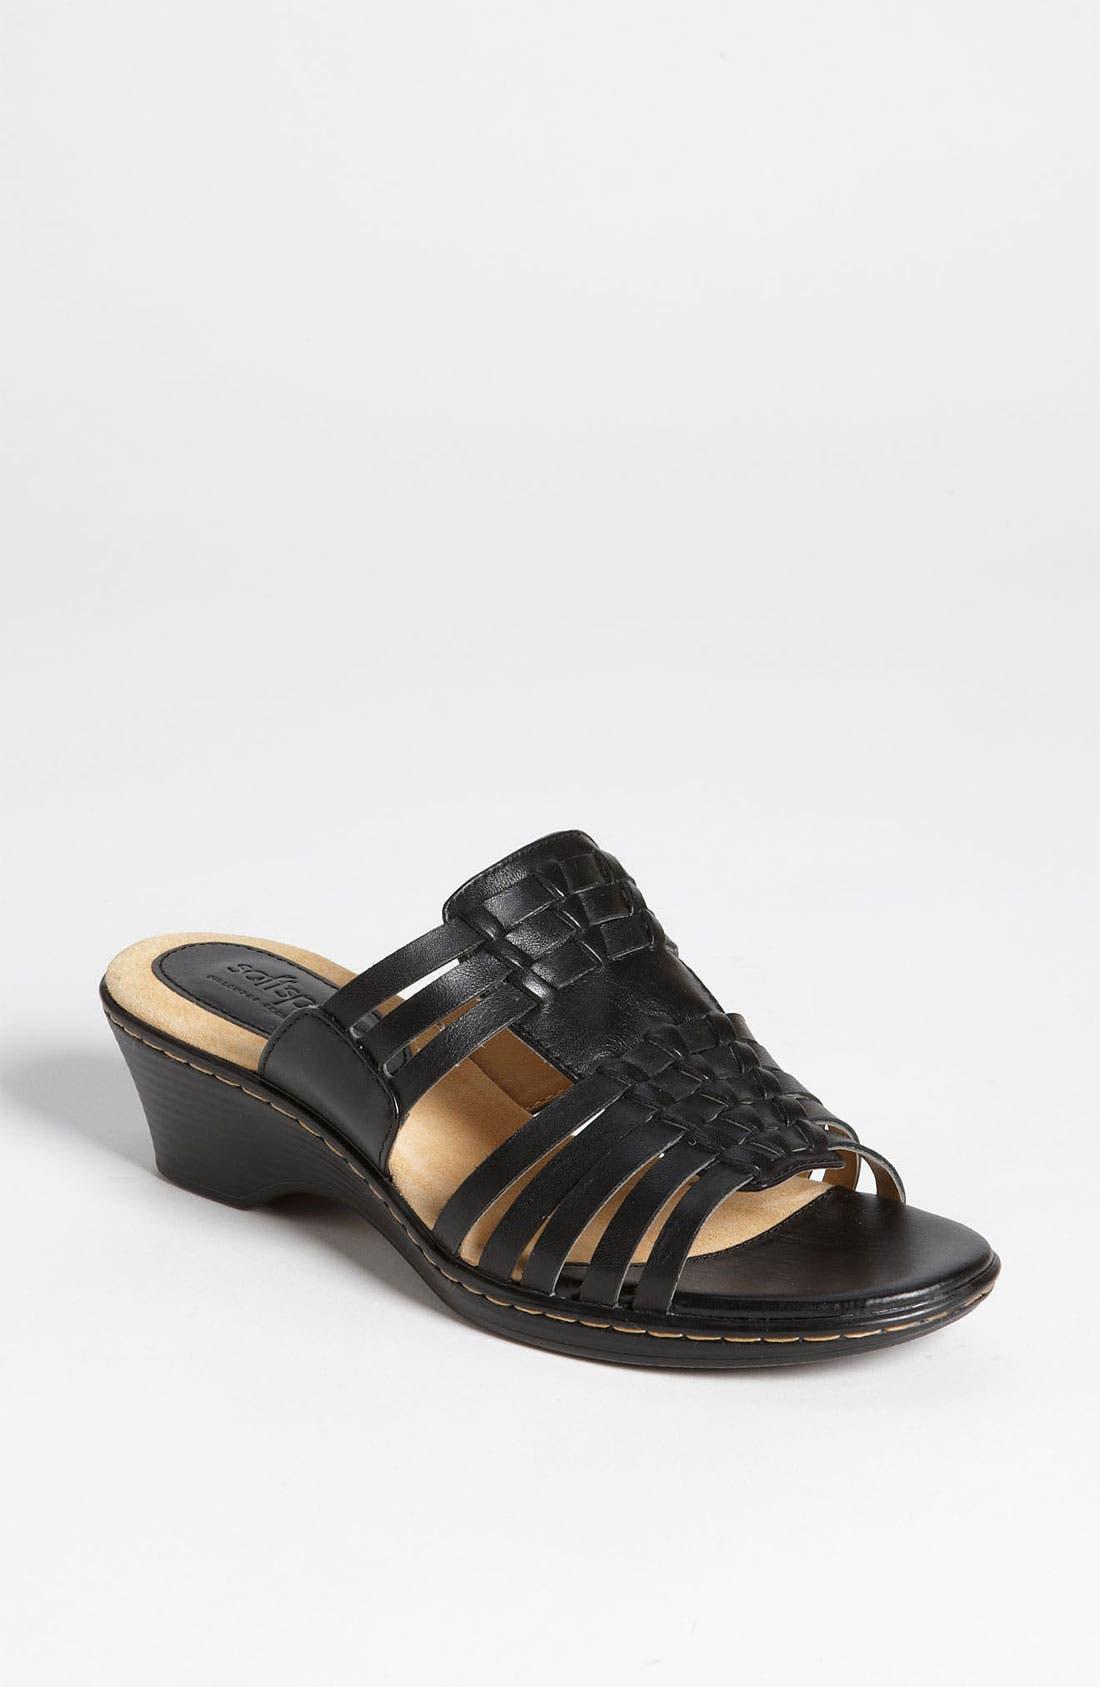 Main Image - Softspots 'Helix' Sandal